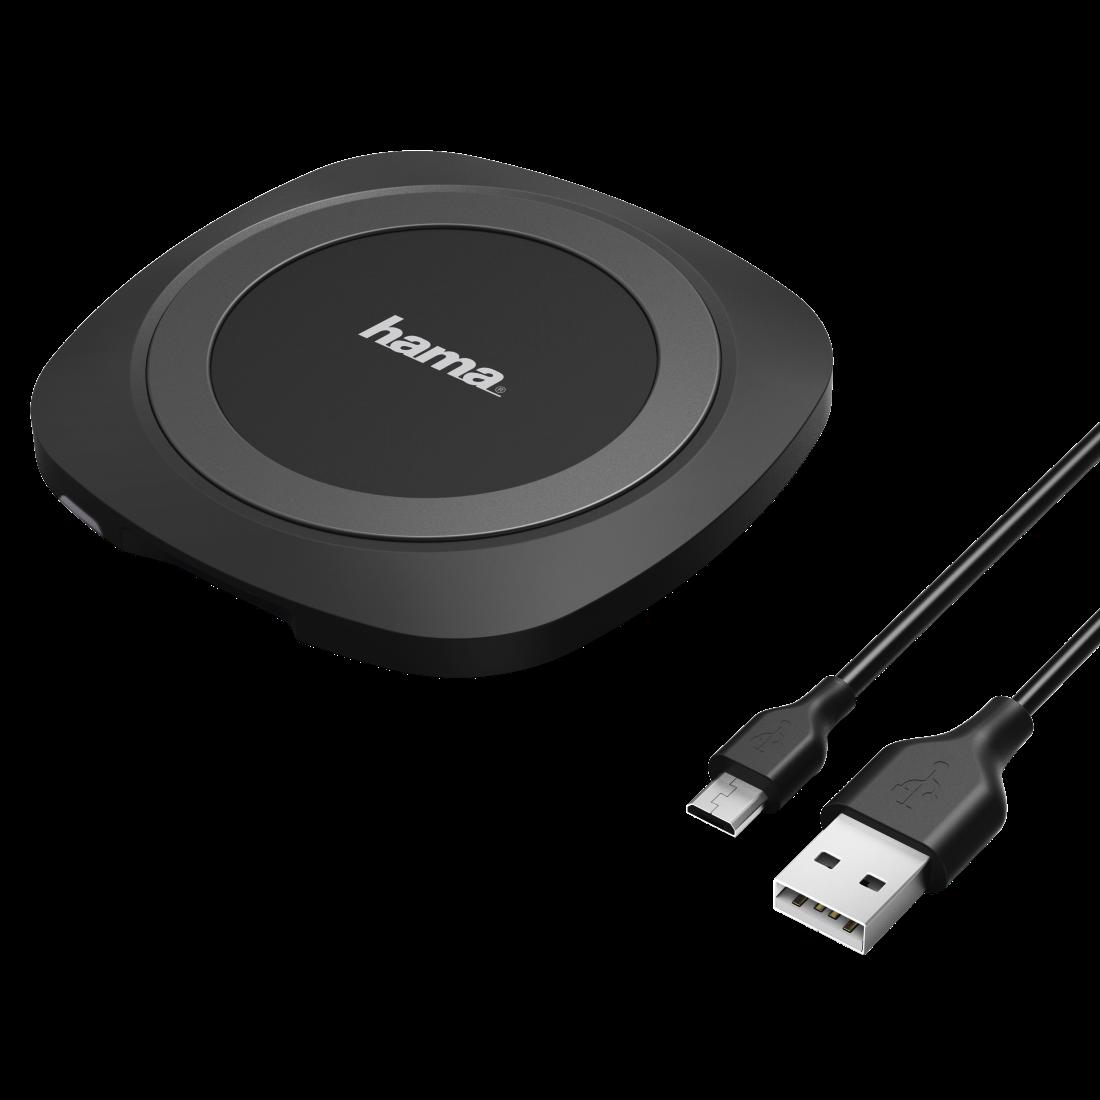 00080599 hama wireless ladeger t basic f r smartphones. Black Bedroom Furniture Sets. Home Design Ideas